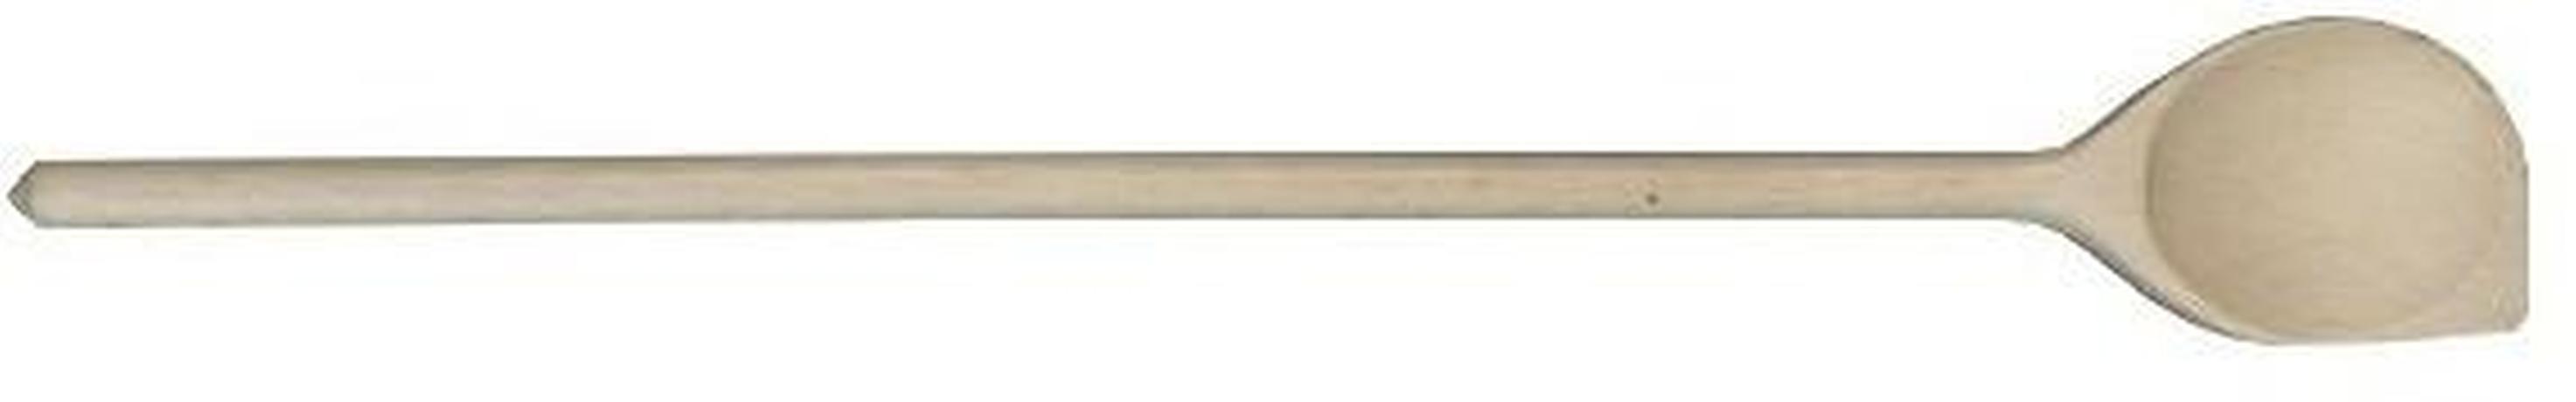 TORO   Vařečka kulatá s rohem, 29, 5 x 4, 4 x 0, 7 cm